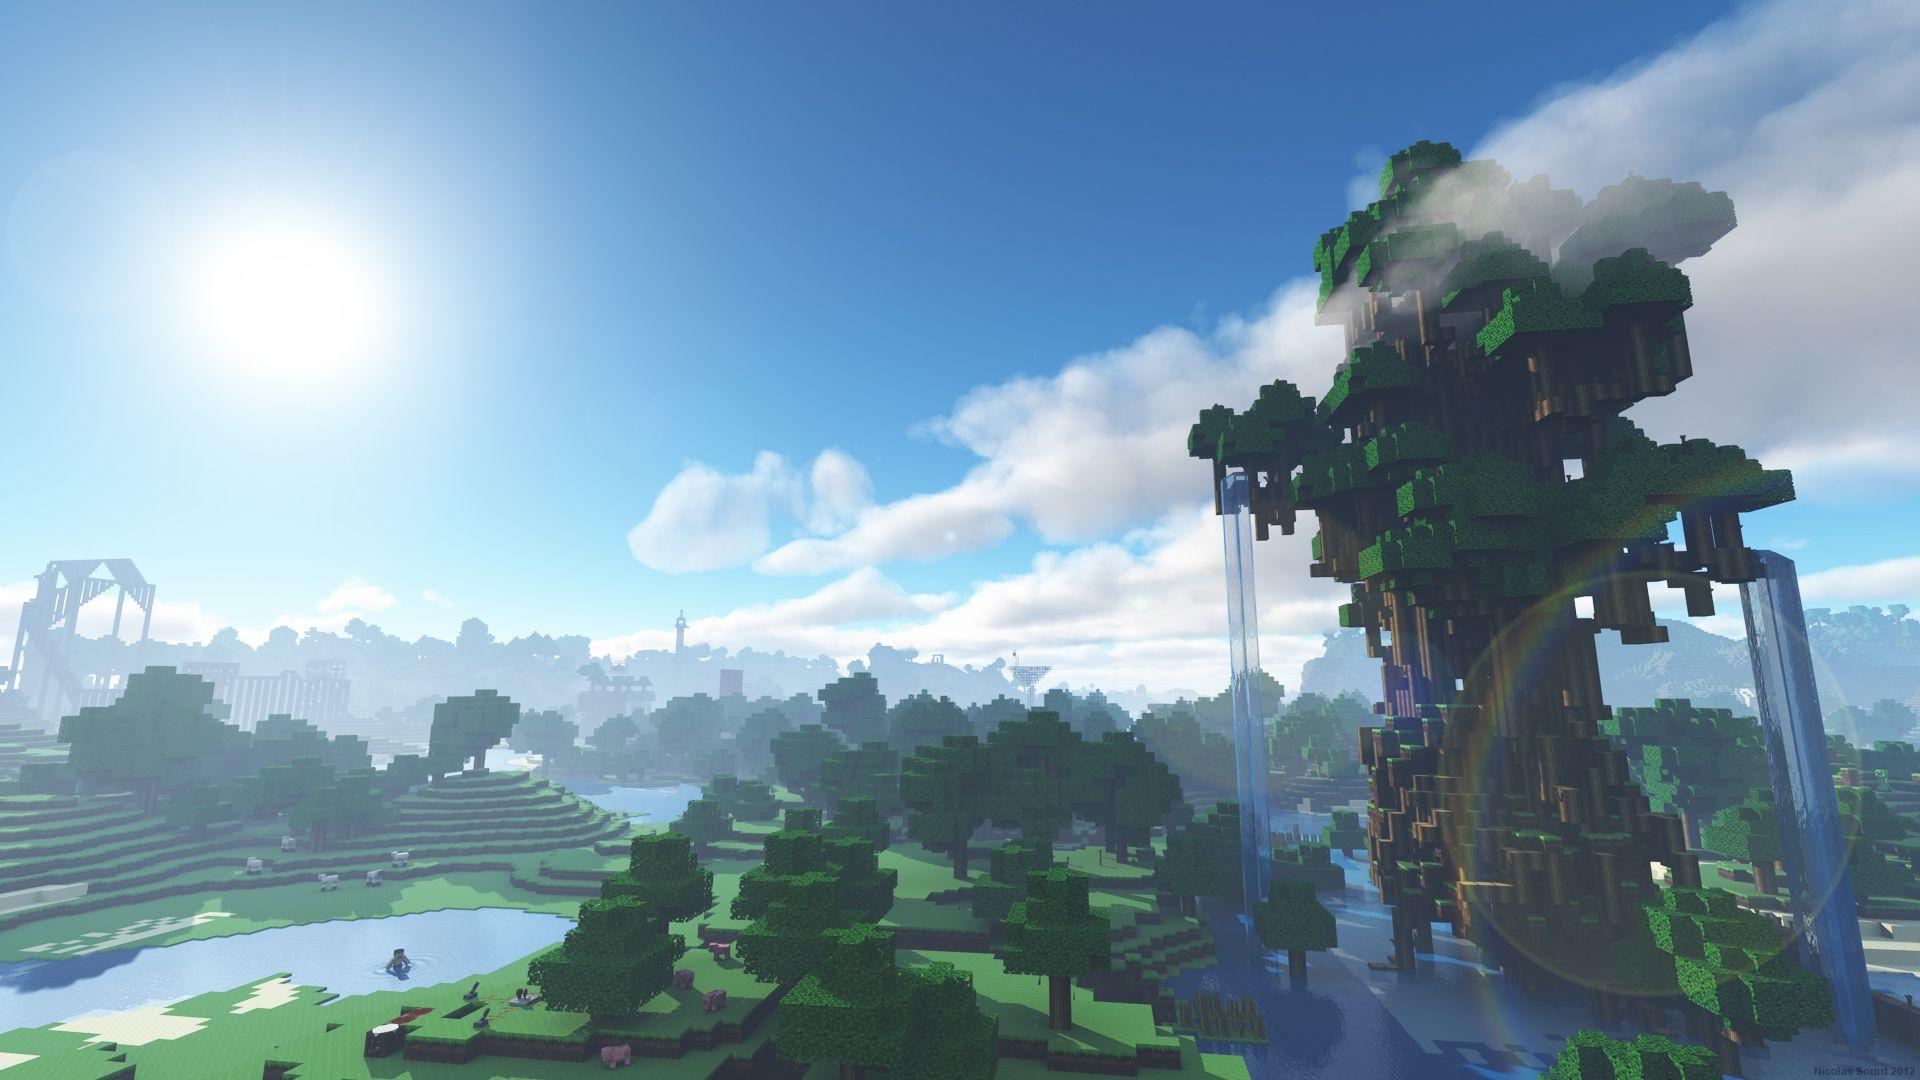 Blue Sky Minecraft Wallpaper Minecraft Shaders Background